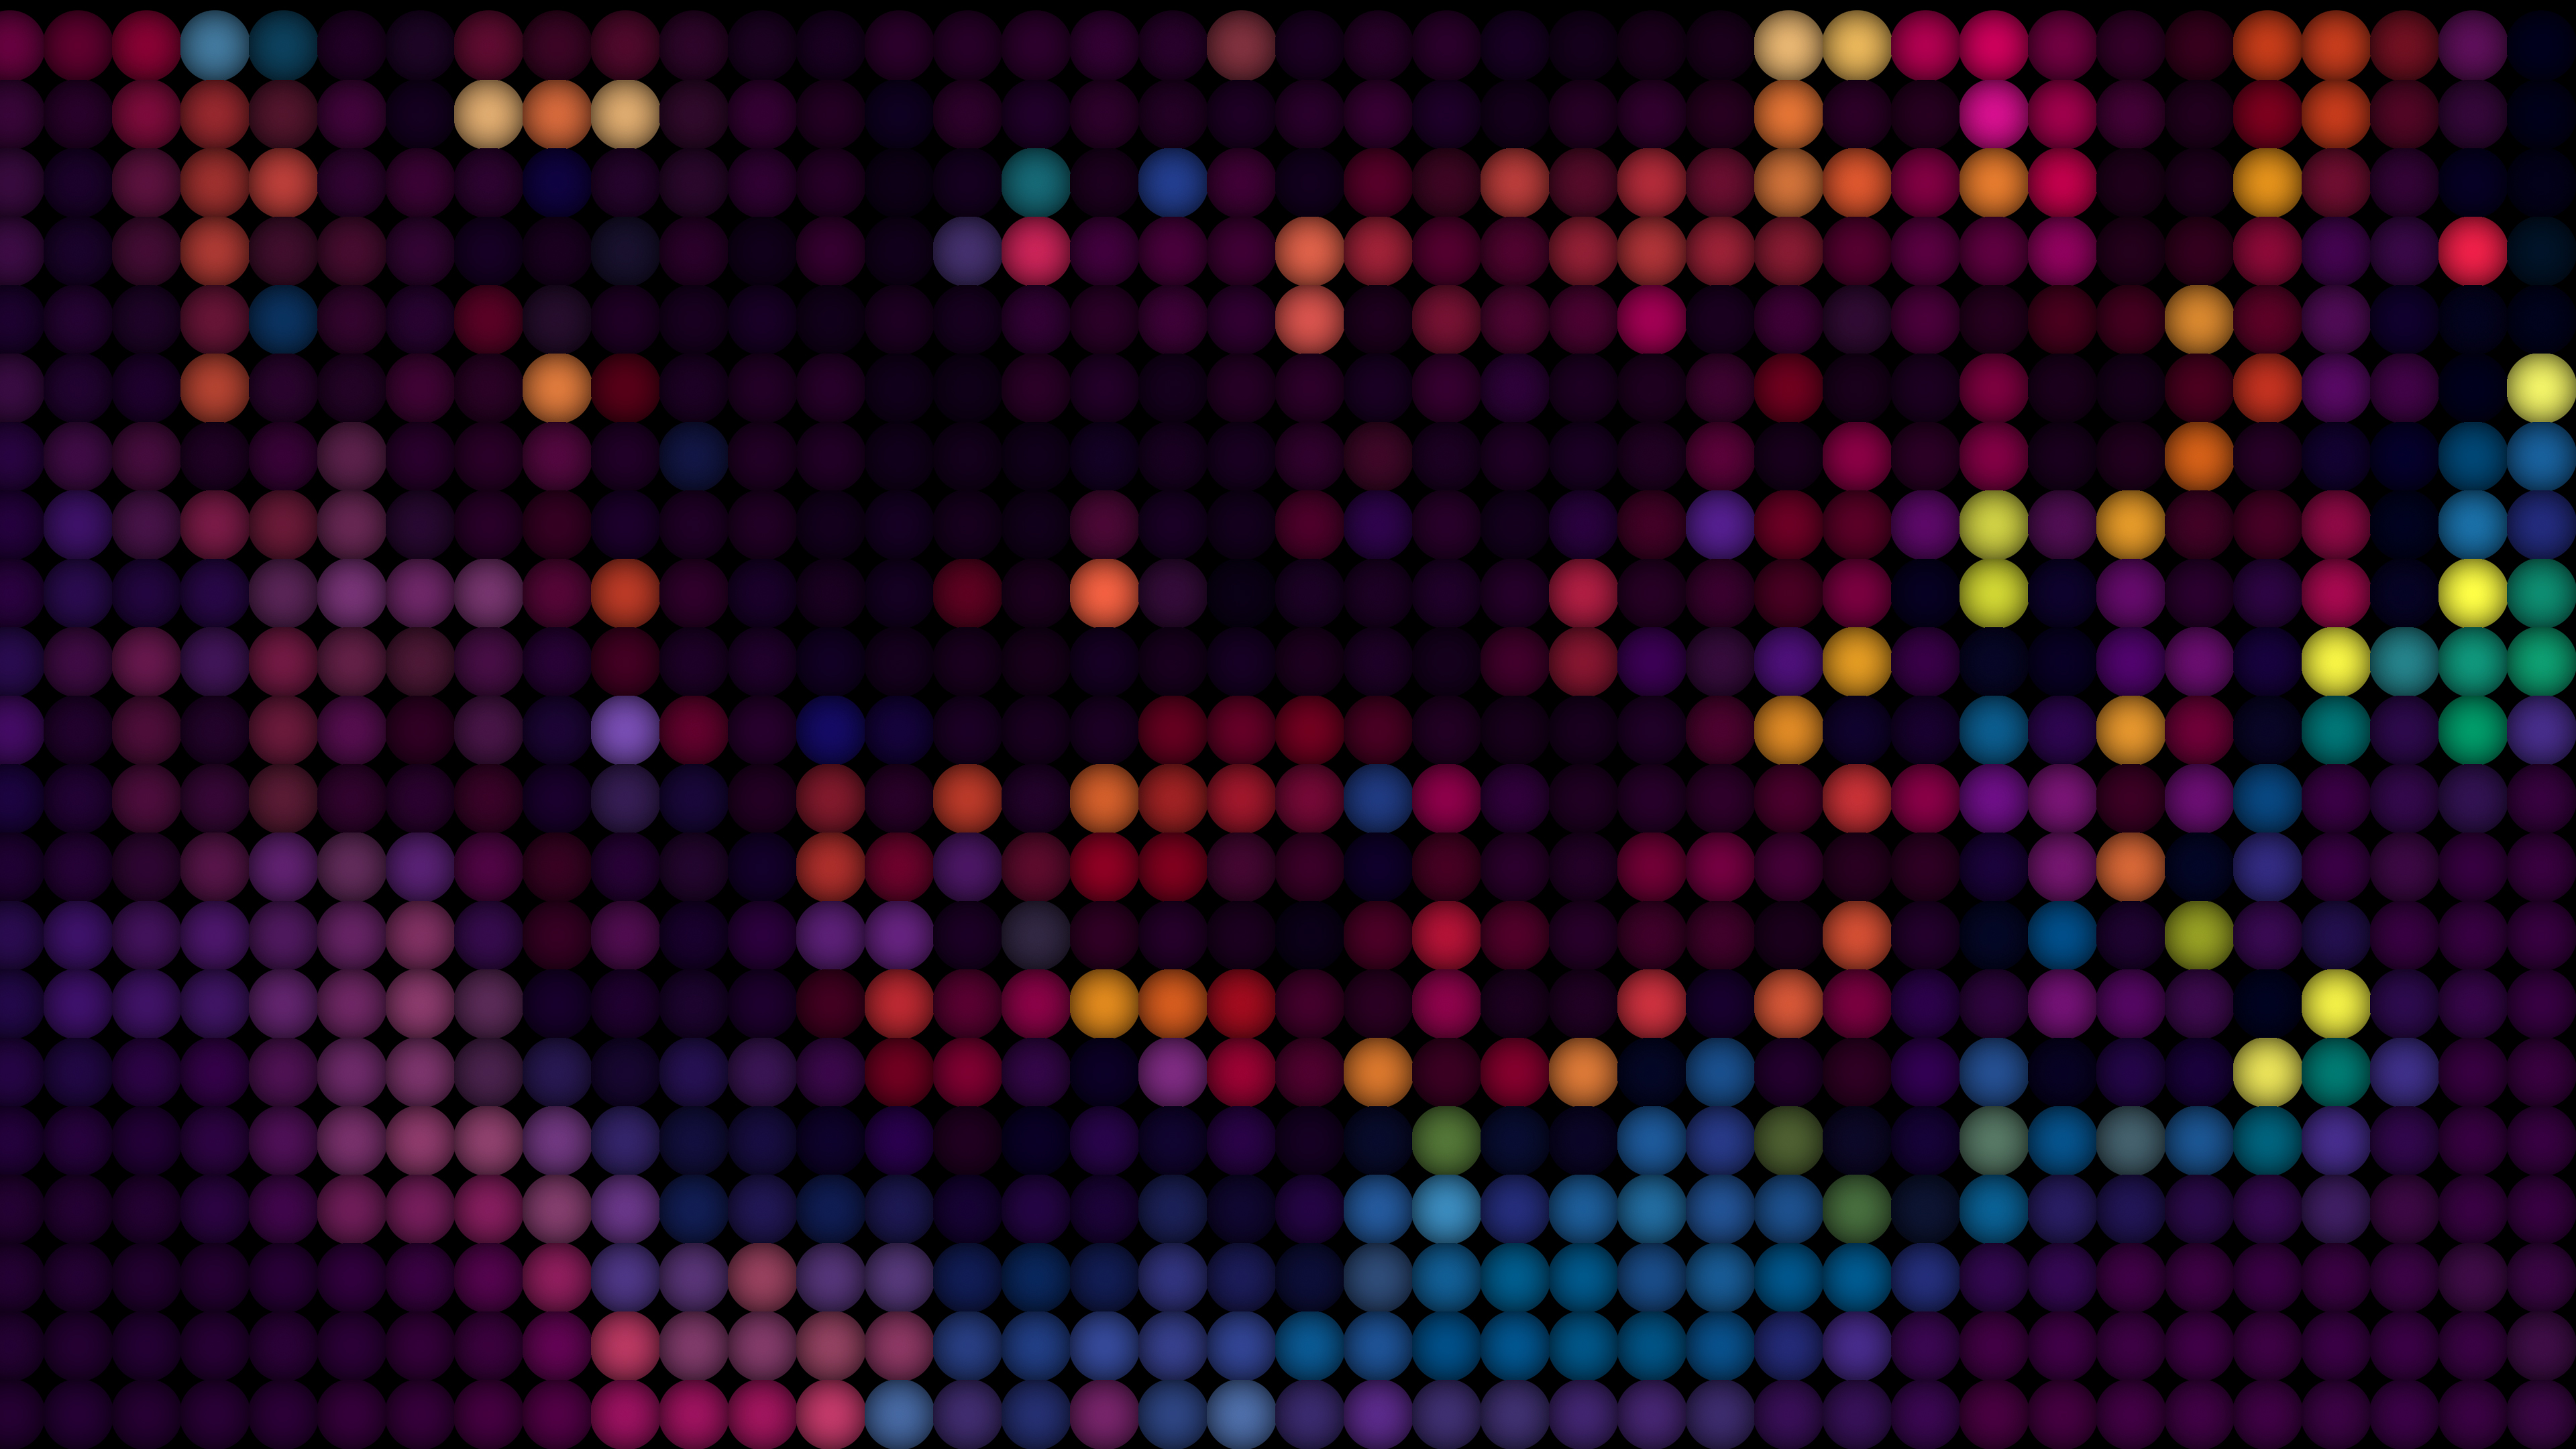 abstract bokeh lights 1575661434 - Abstract Bokeh Lights -